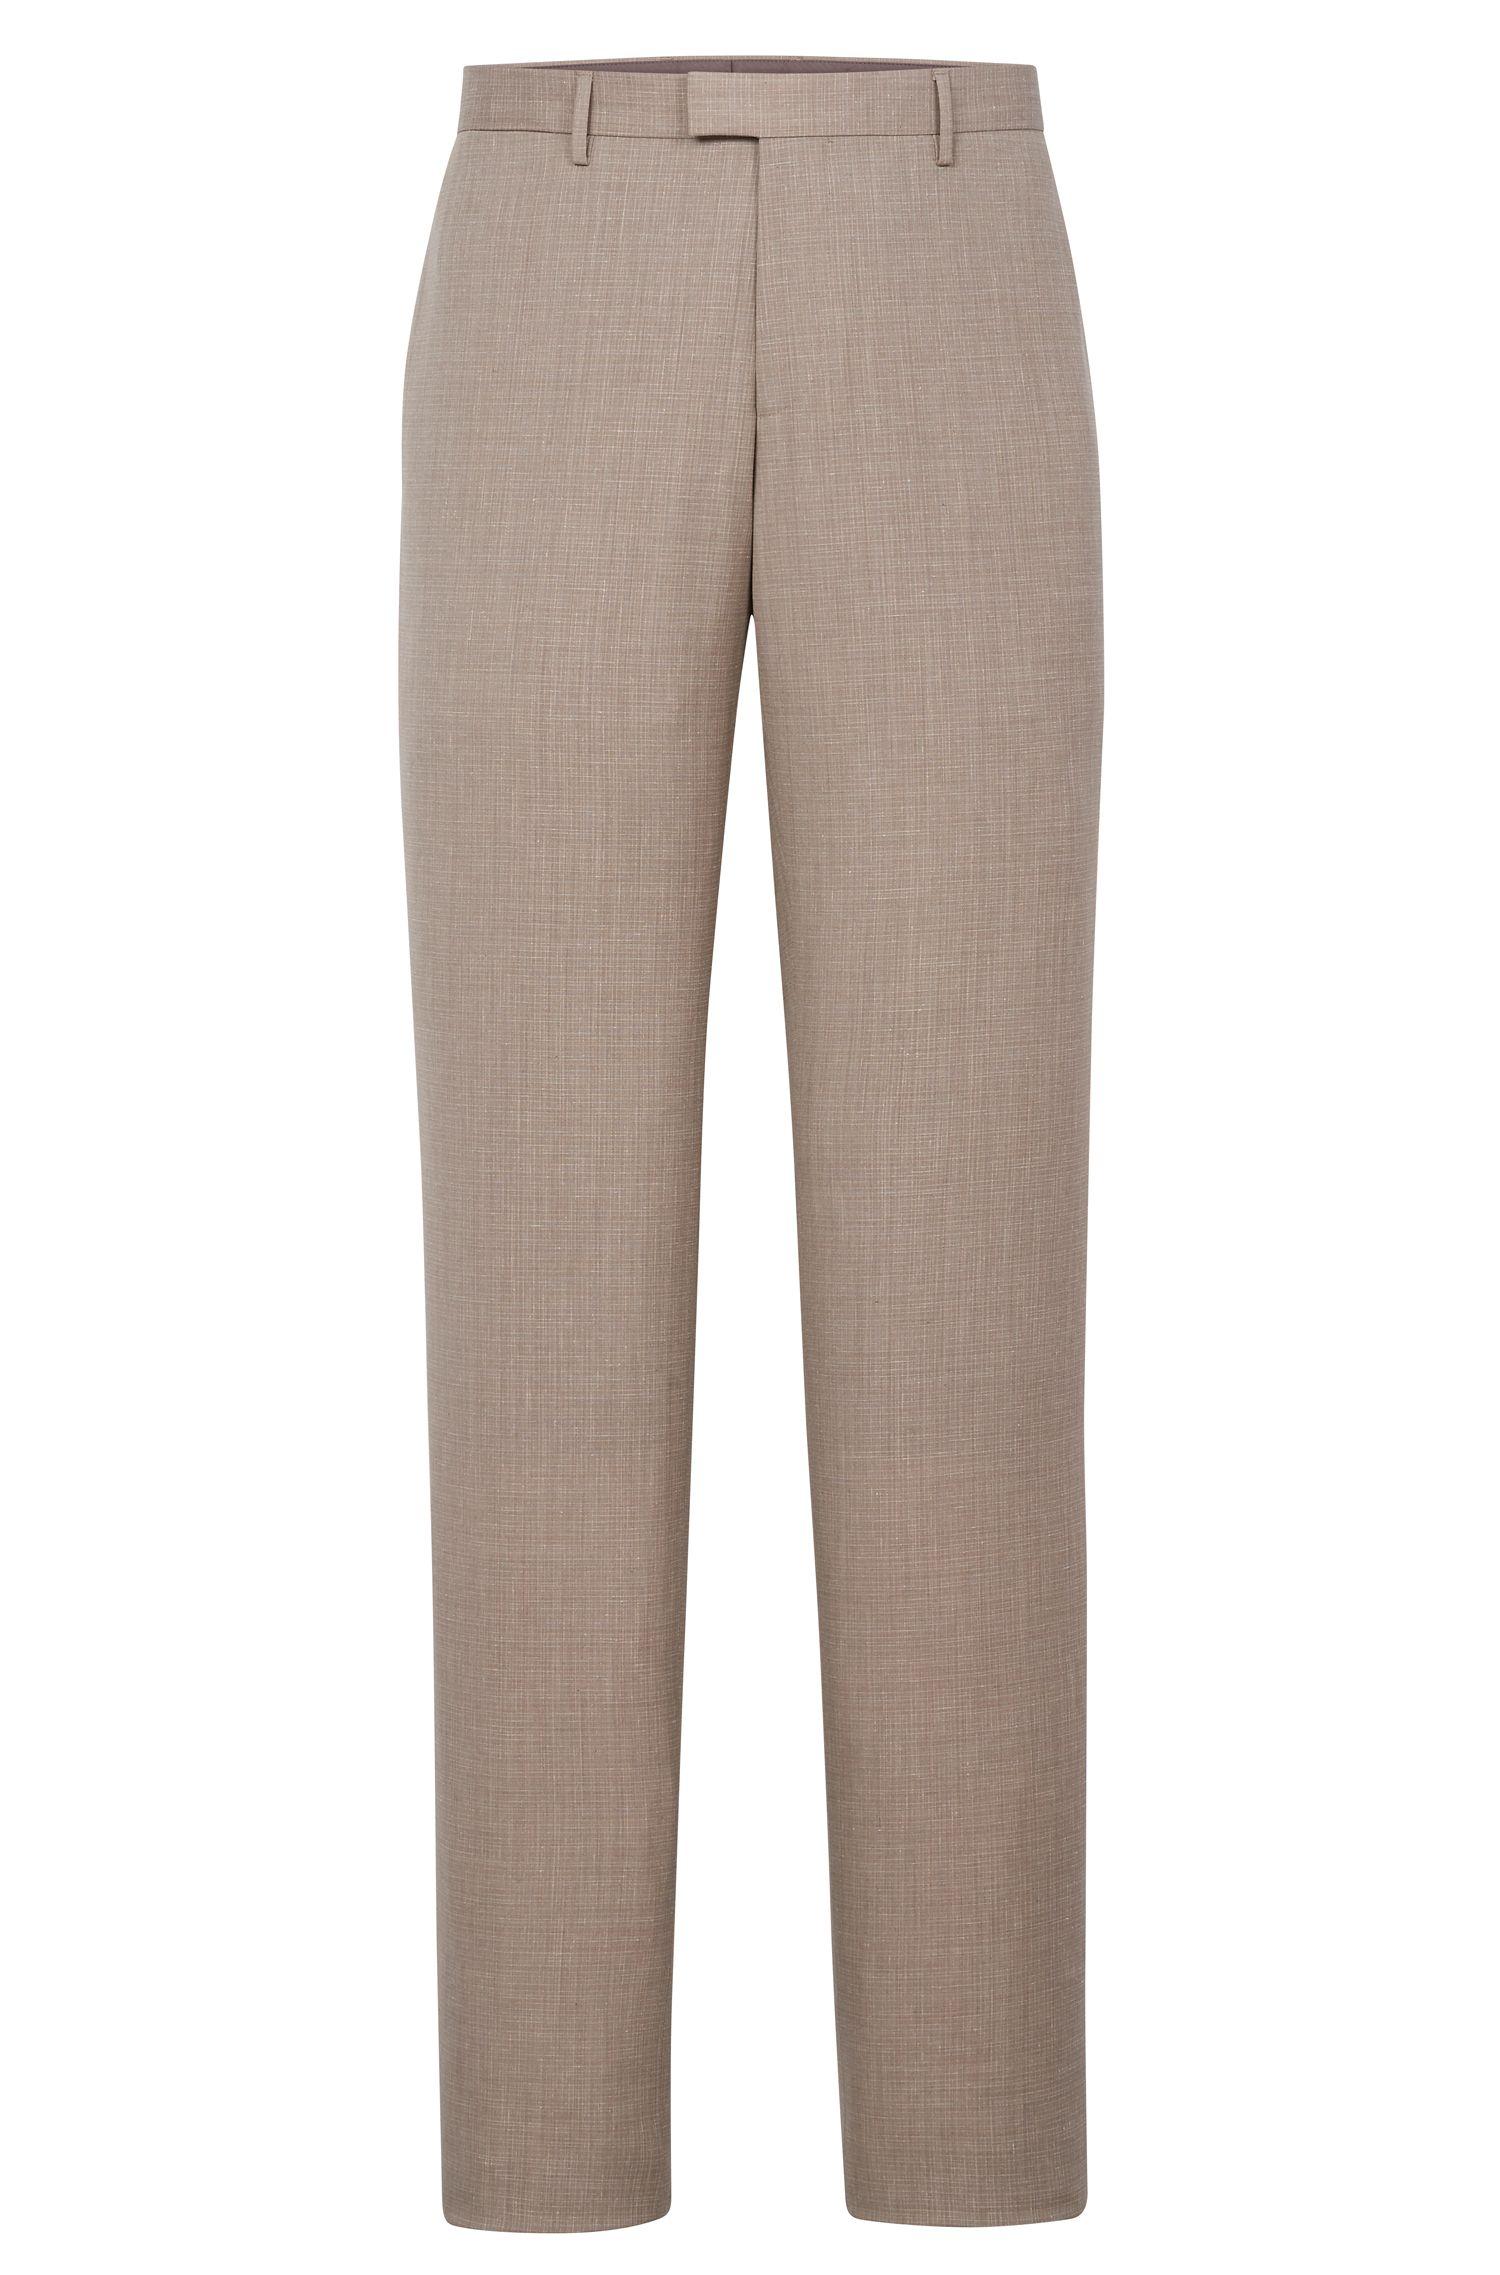 Italian Wool Cotton Silk Linen Dress Pant, Slim Fit | T-Gary